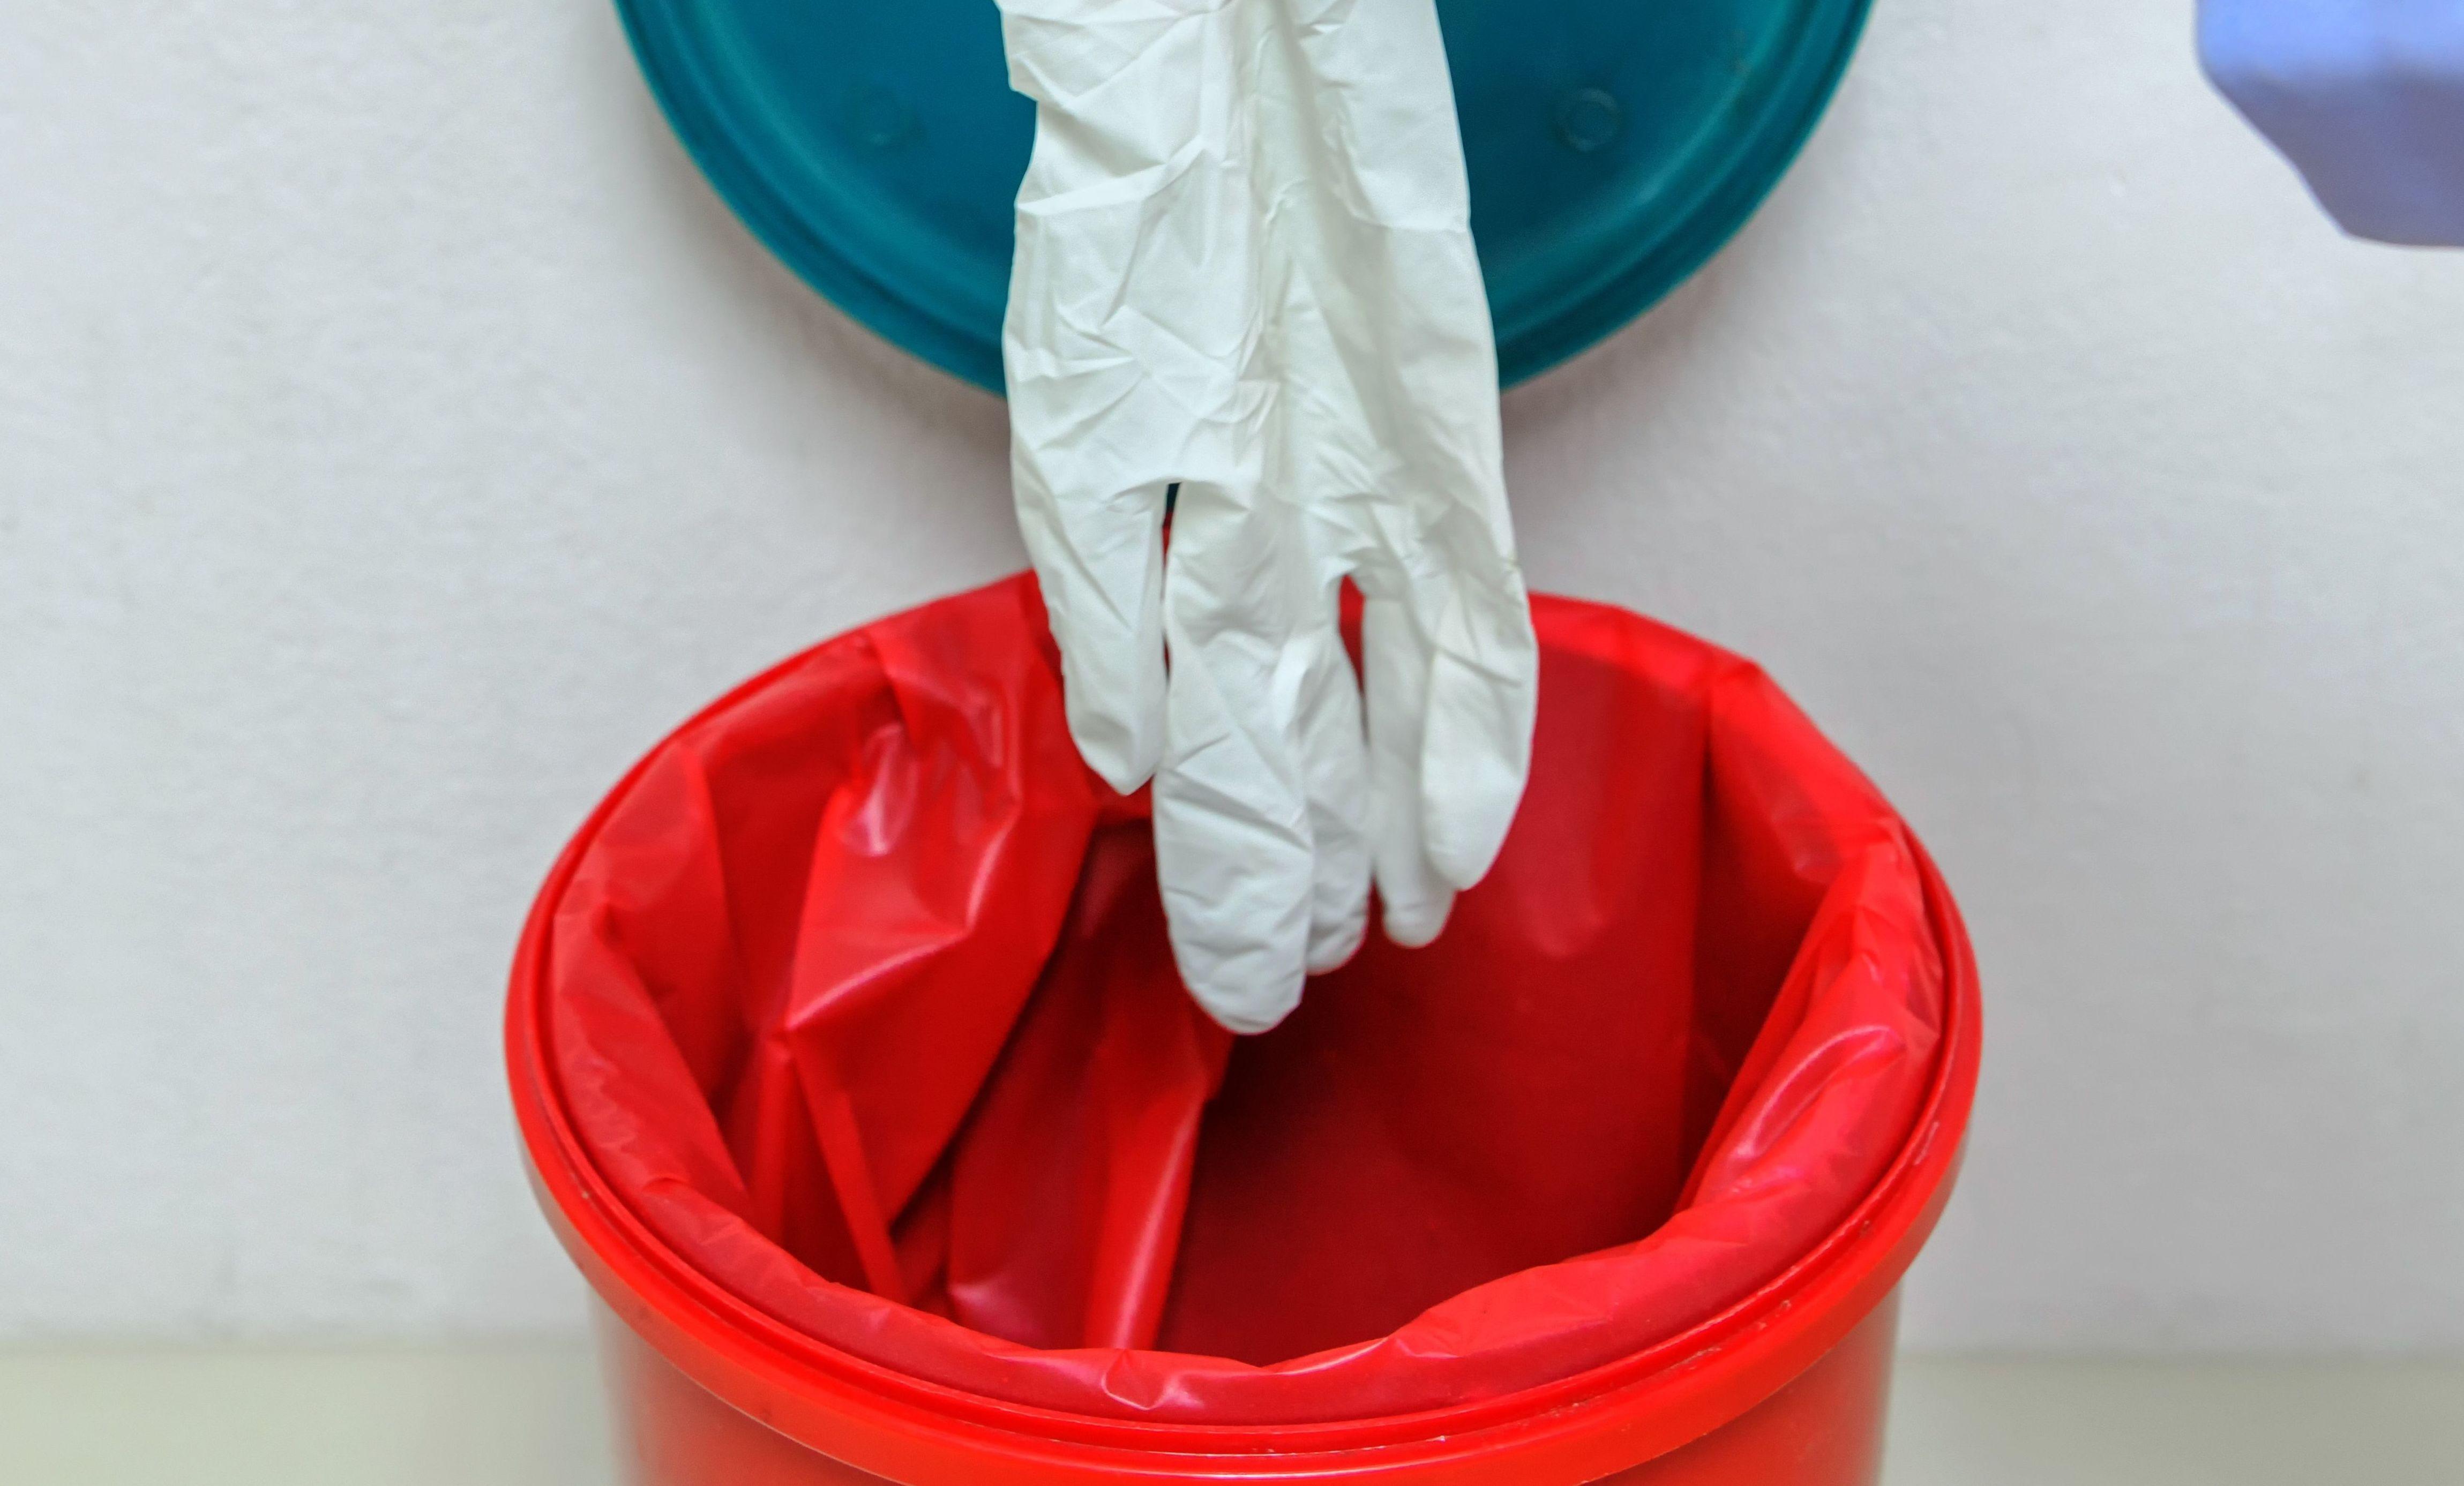 Bolsas para residuos médicos en Madrid